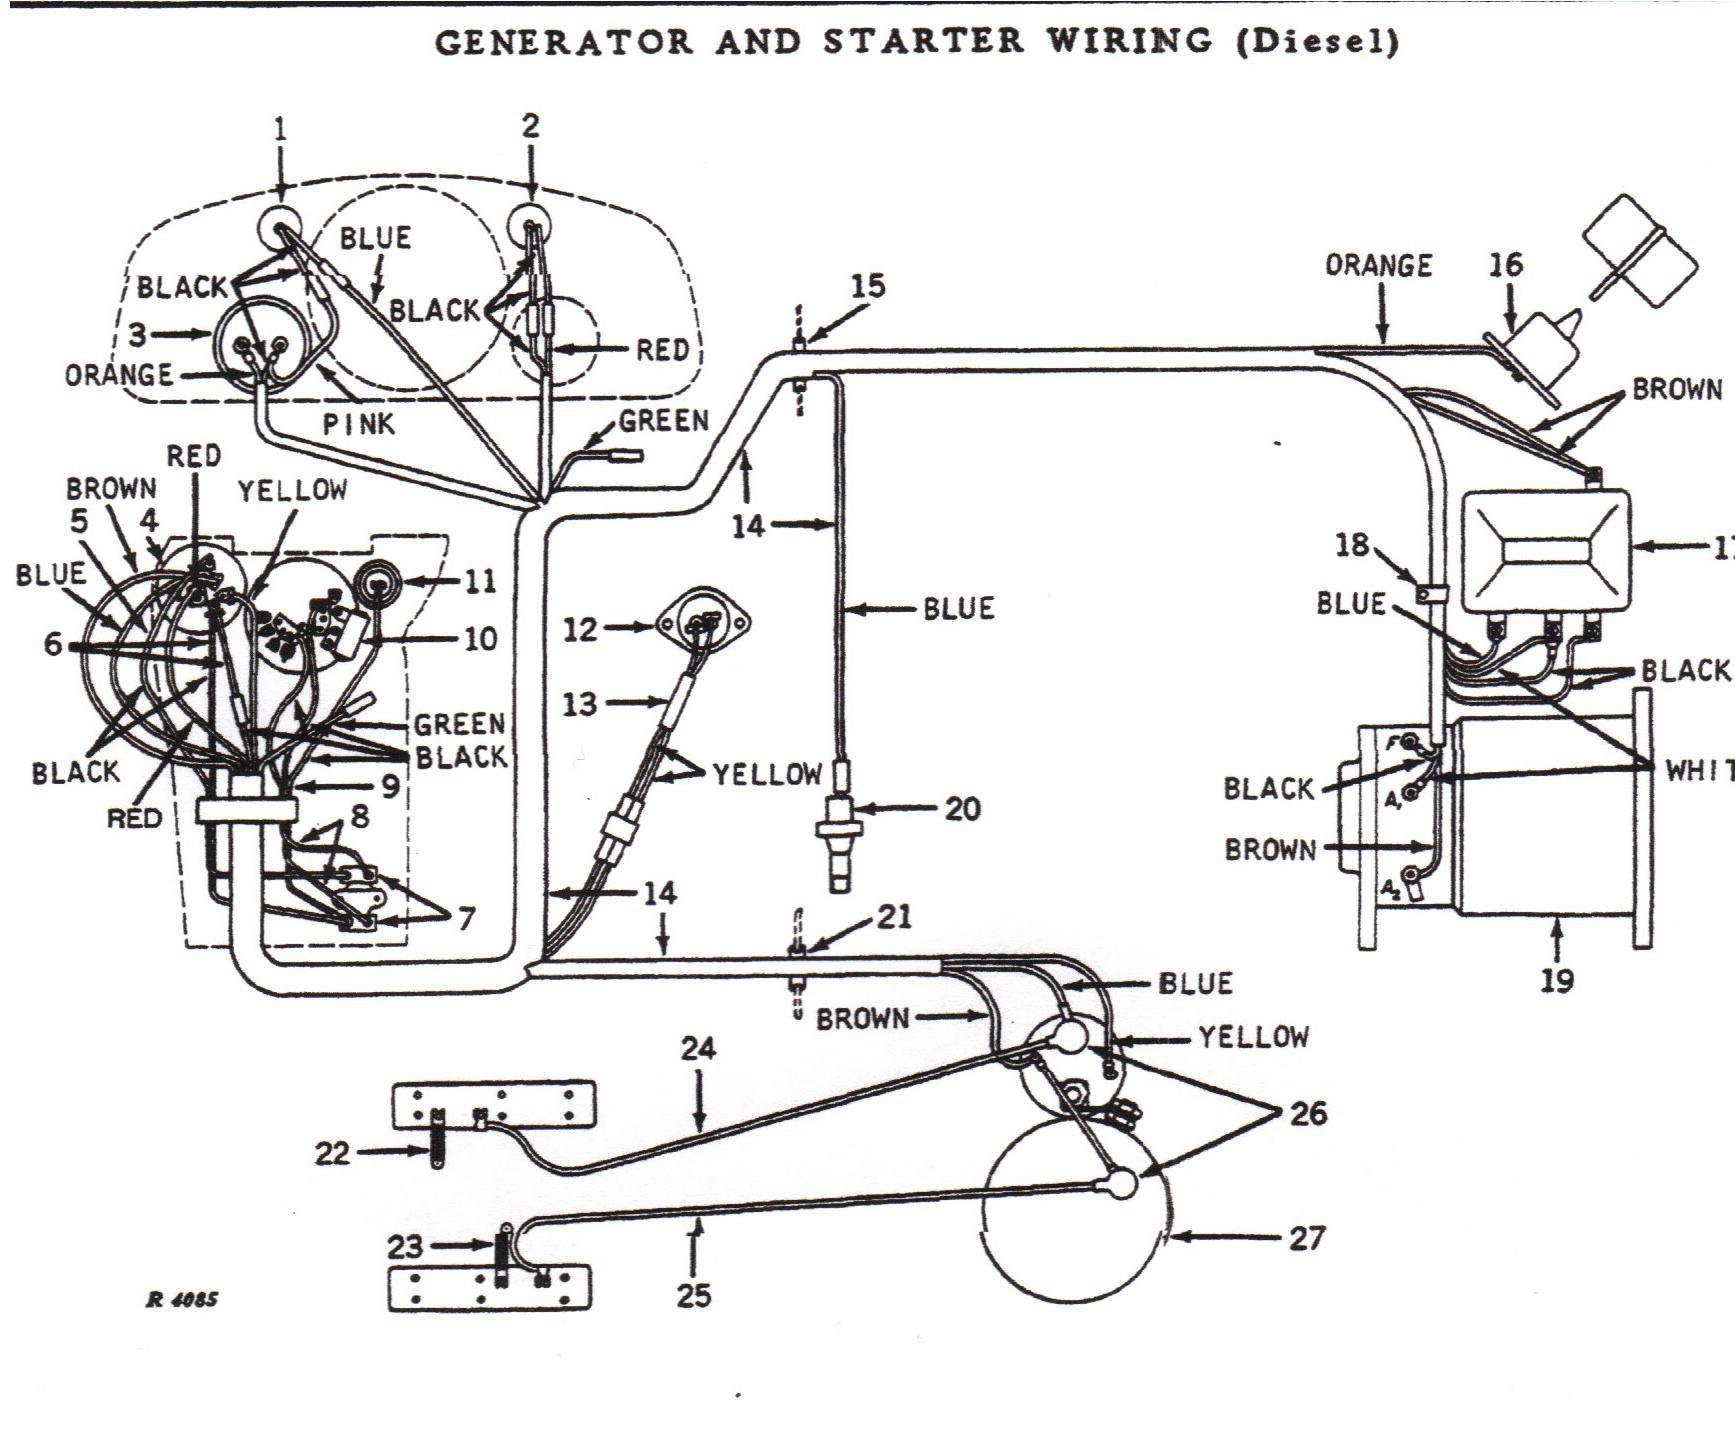 Where is Fuse On John Deere 4020 Diagram] Honda A Wiring Diagram Full Version Hd Quality Of Where is Fuse On John Deere 4020